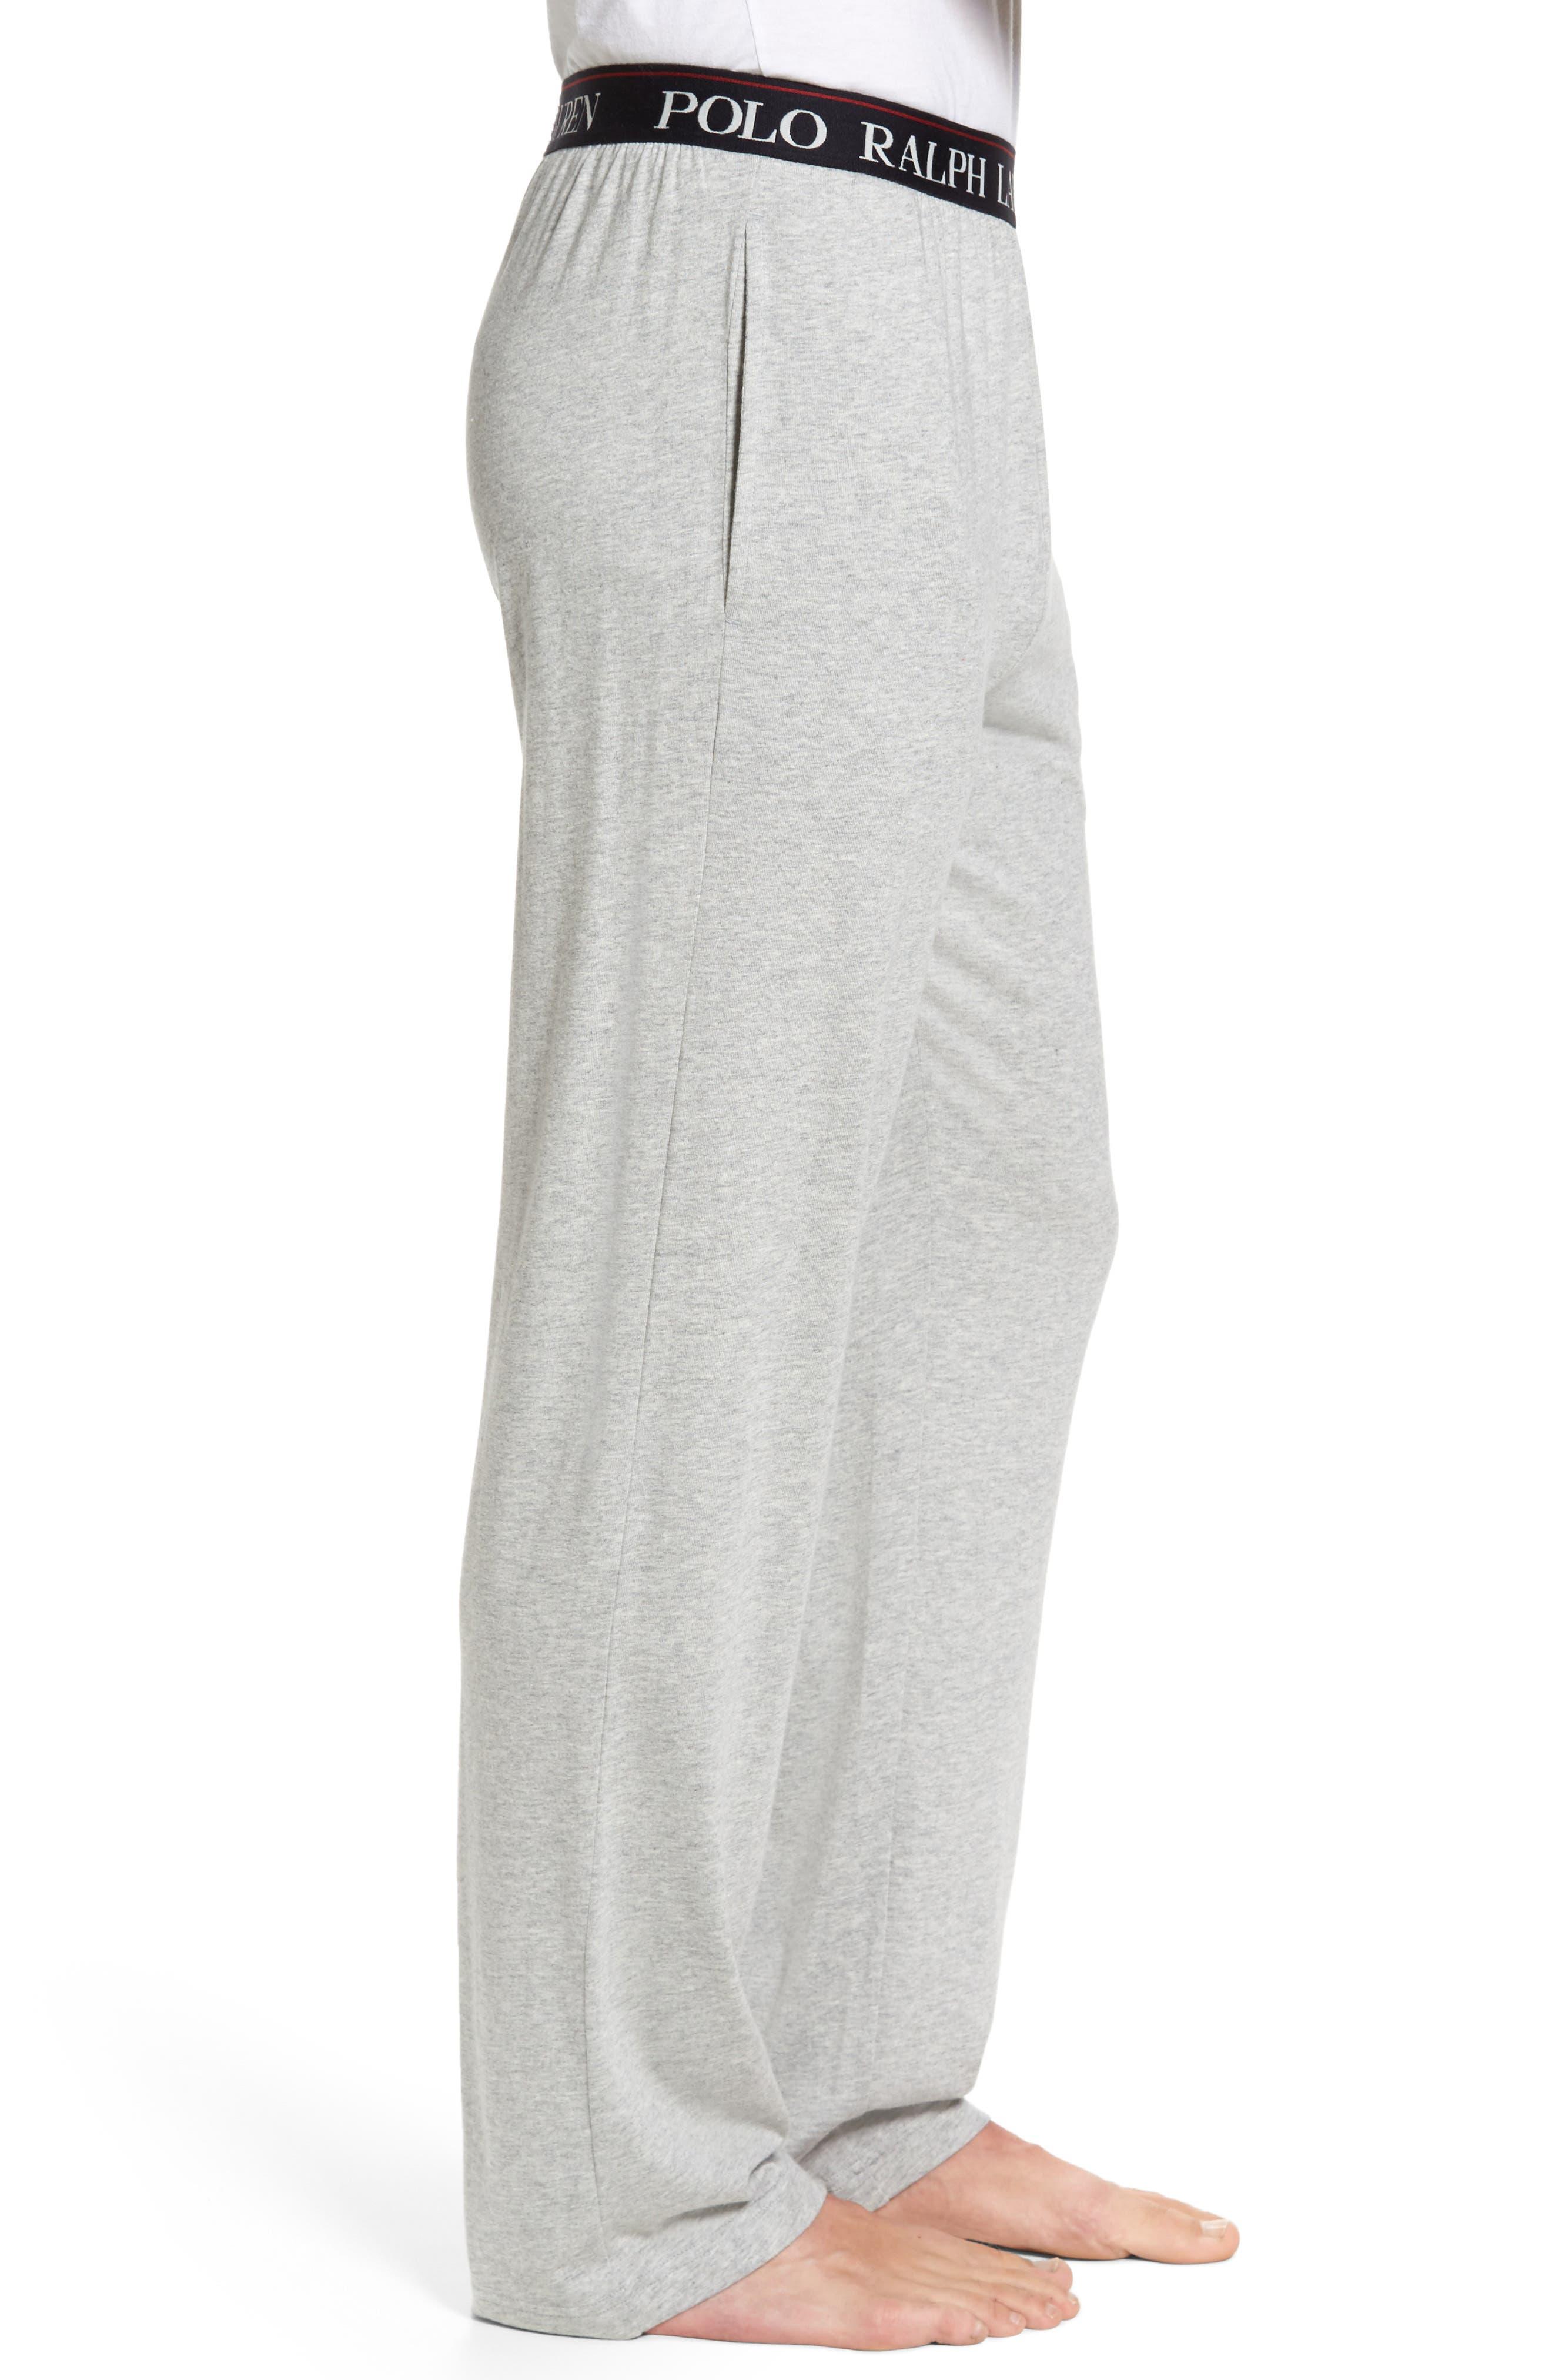 Cotton & Modal Lounge Pants,                             Alternate thumbnail 3, color,                             ANDOVER HEATHER GREY